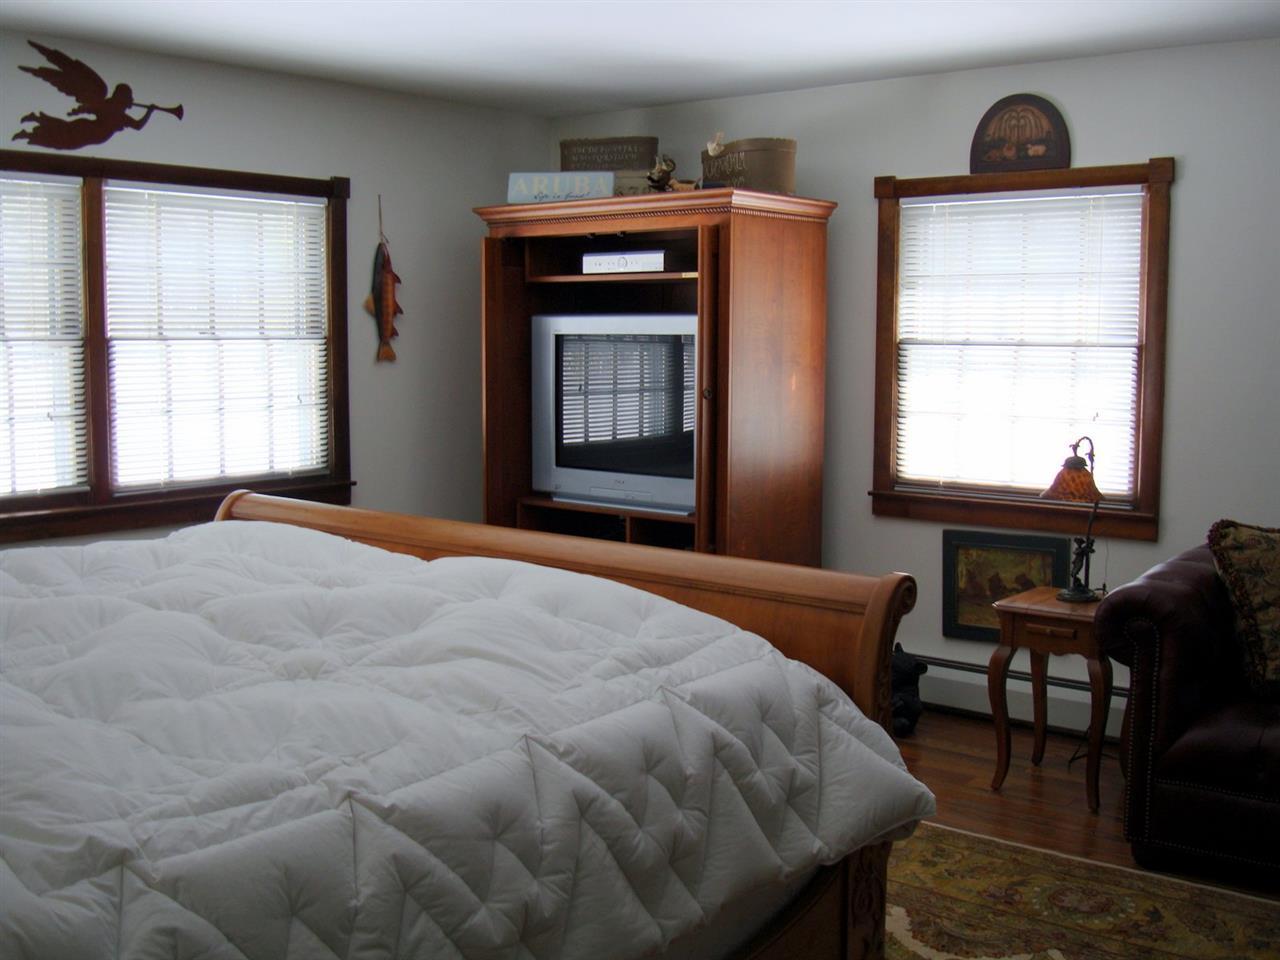 Mount-Snow-Real-Estate-4385548-9